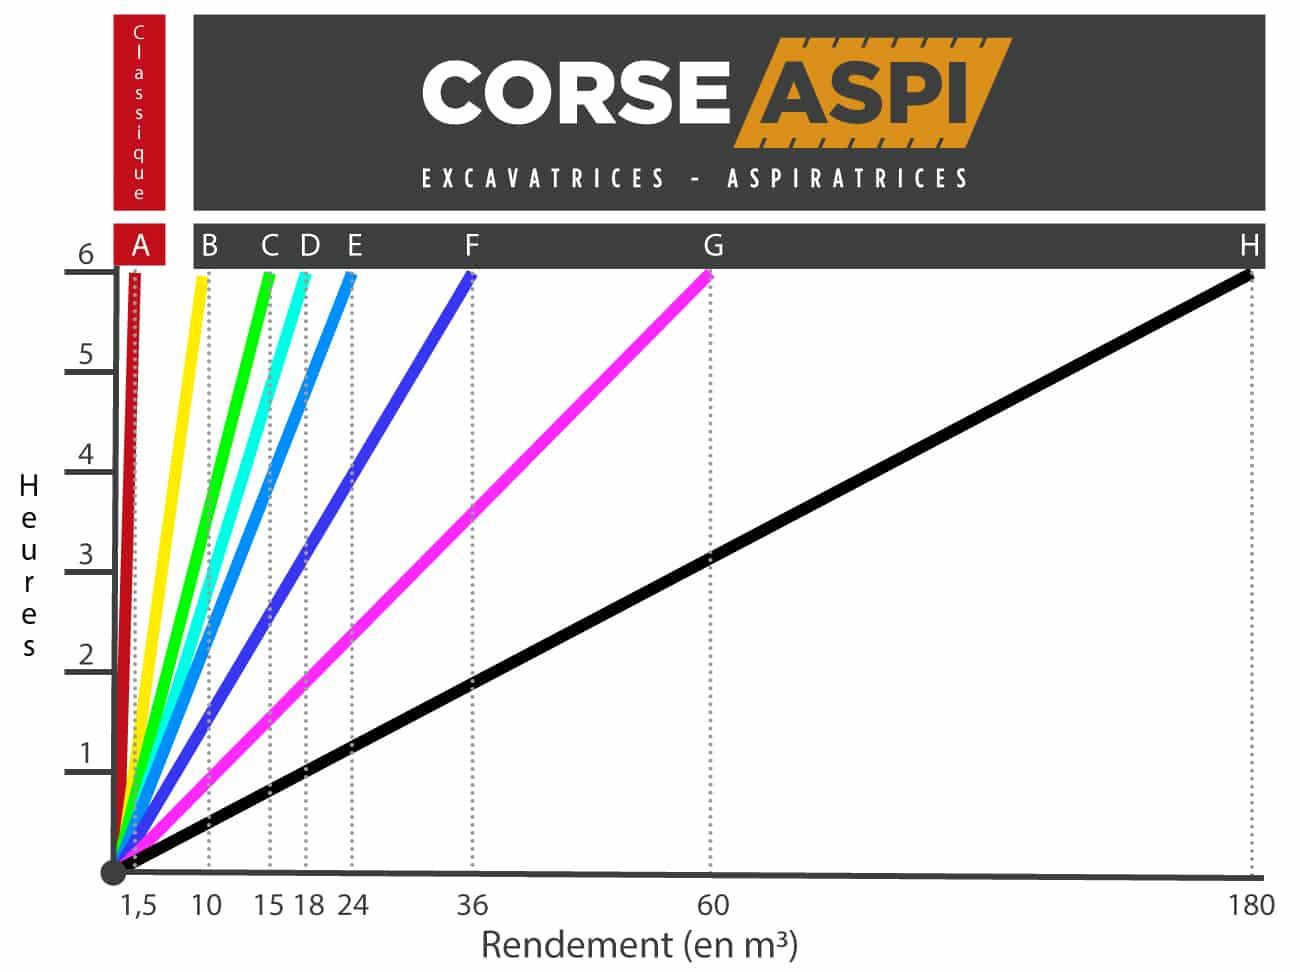 CORSE ASPI - Aspiratrice Excavatrice